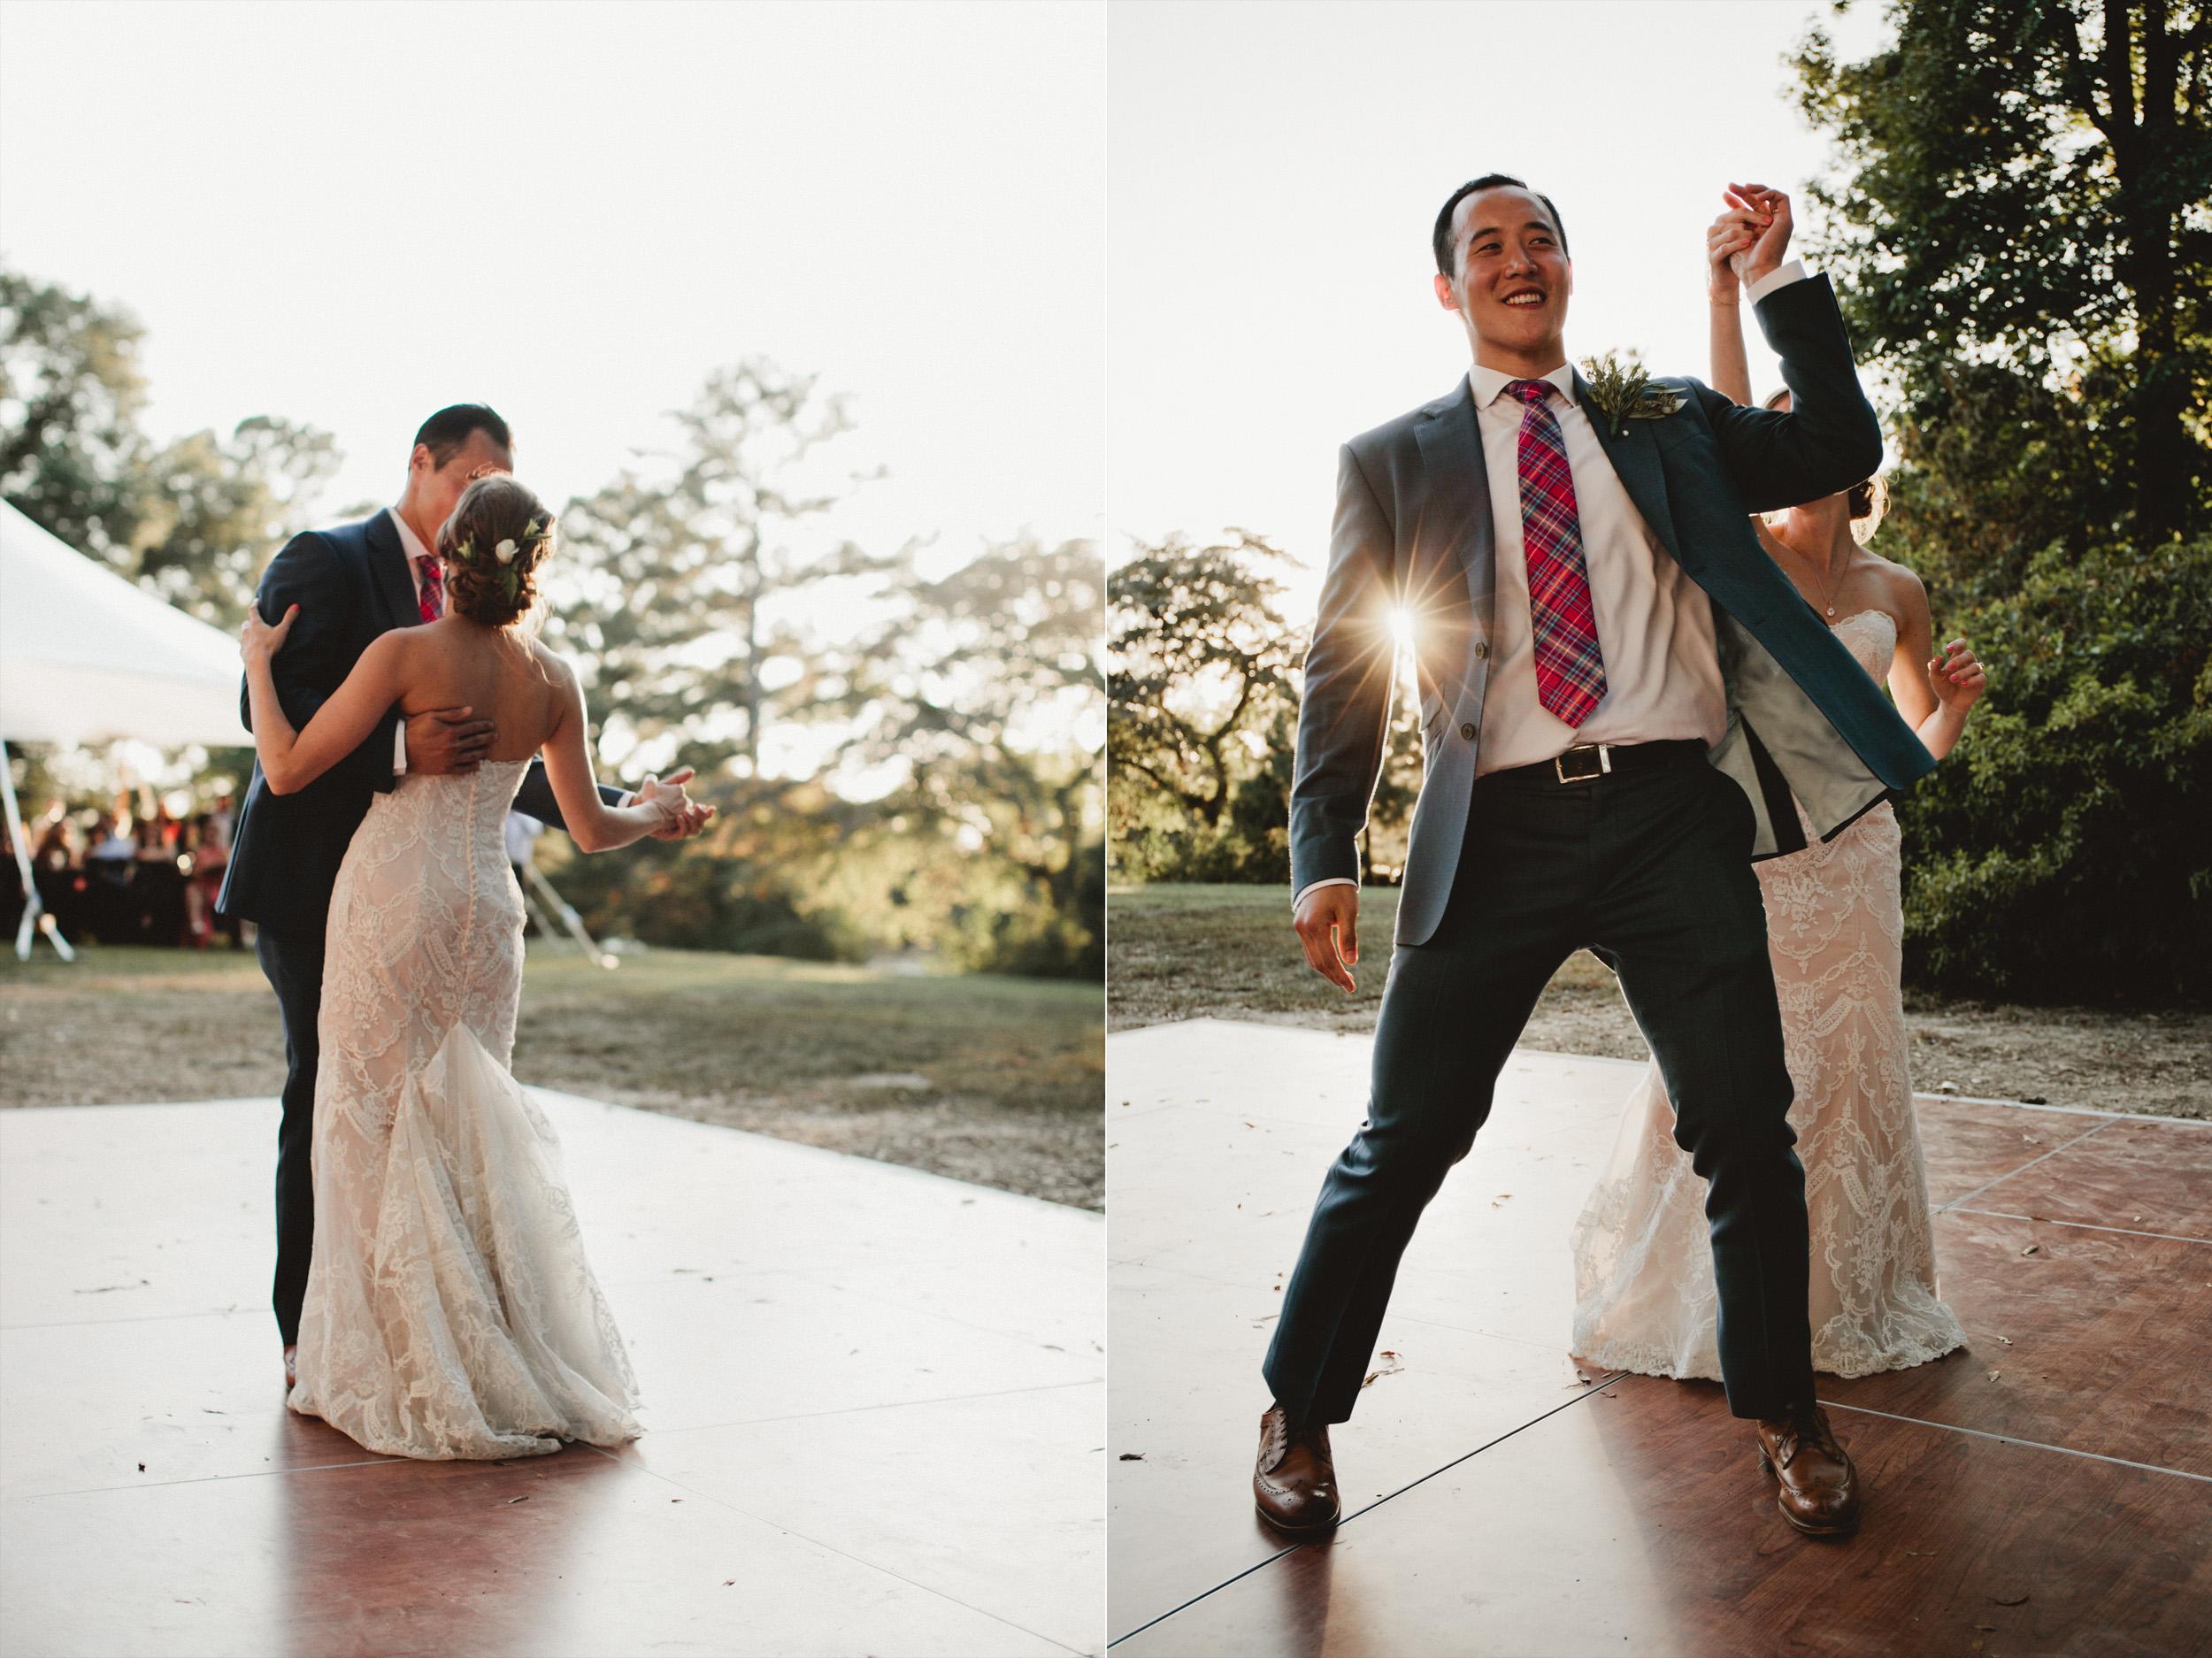 Maine-Wedding-Photographer-917i.jpg